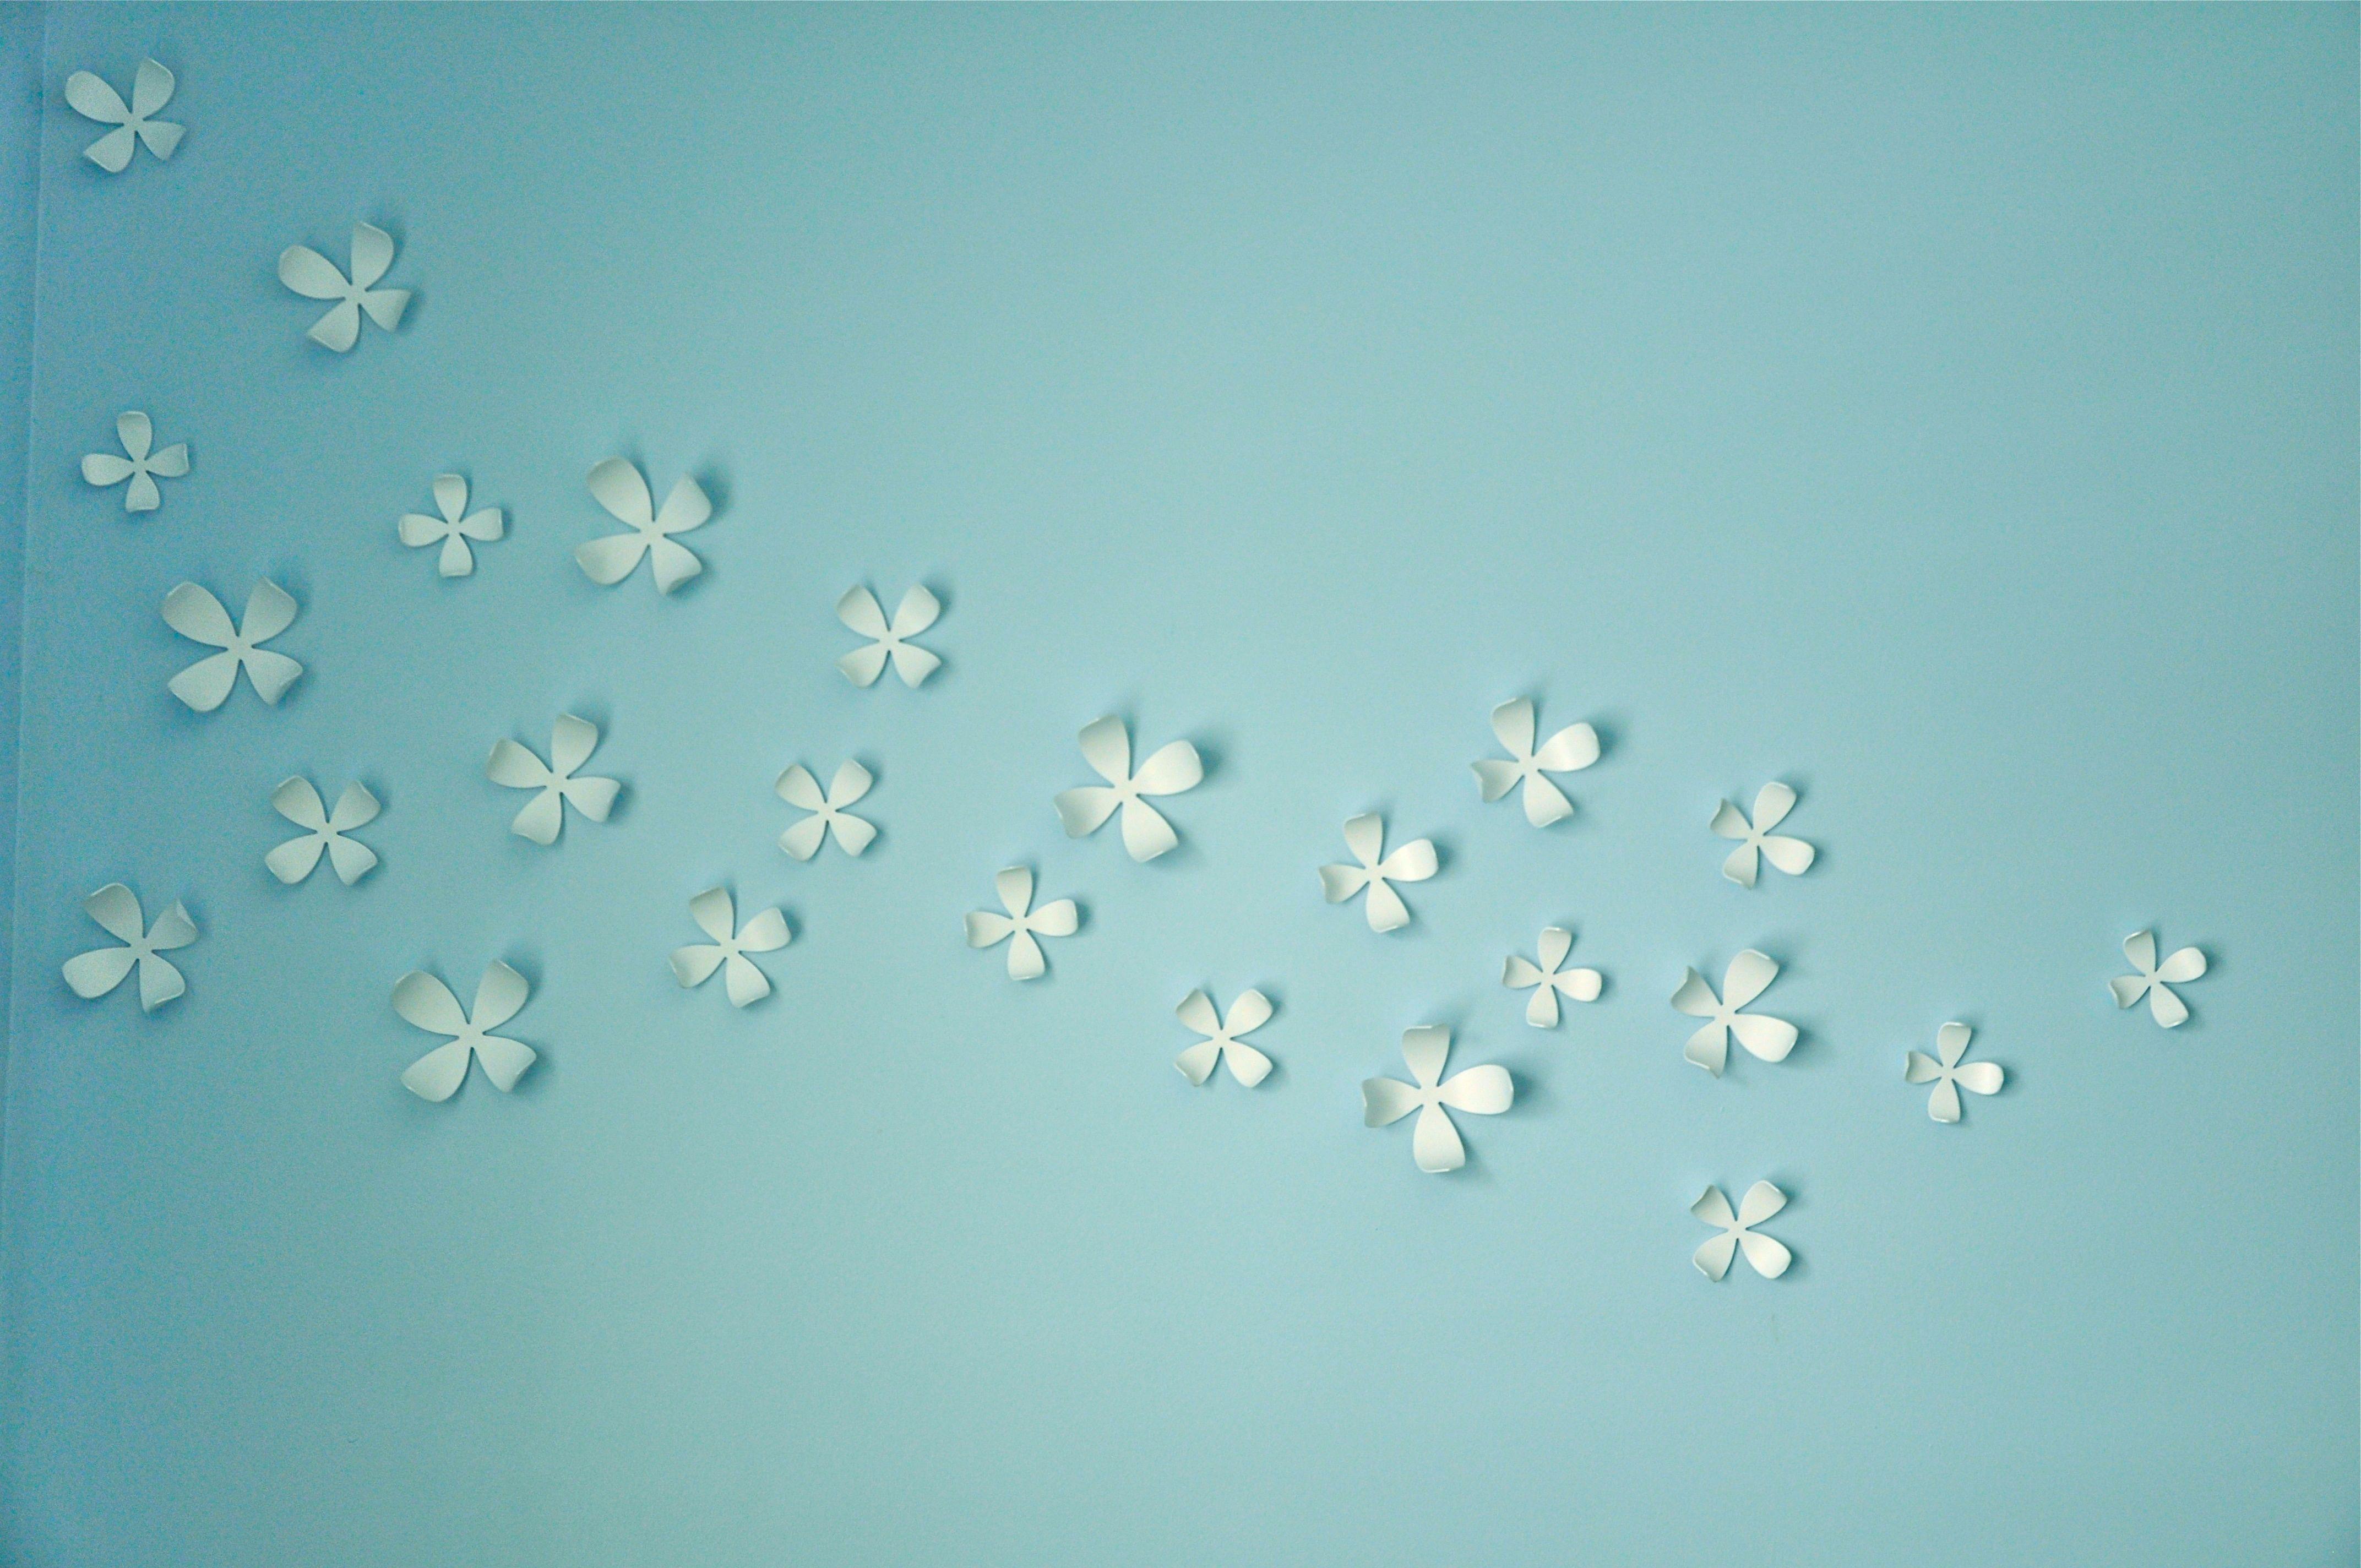 Umbra Wall Flower Decor | Baby | Pinterest | Dormitorio